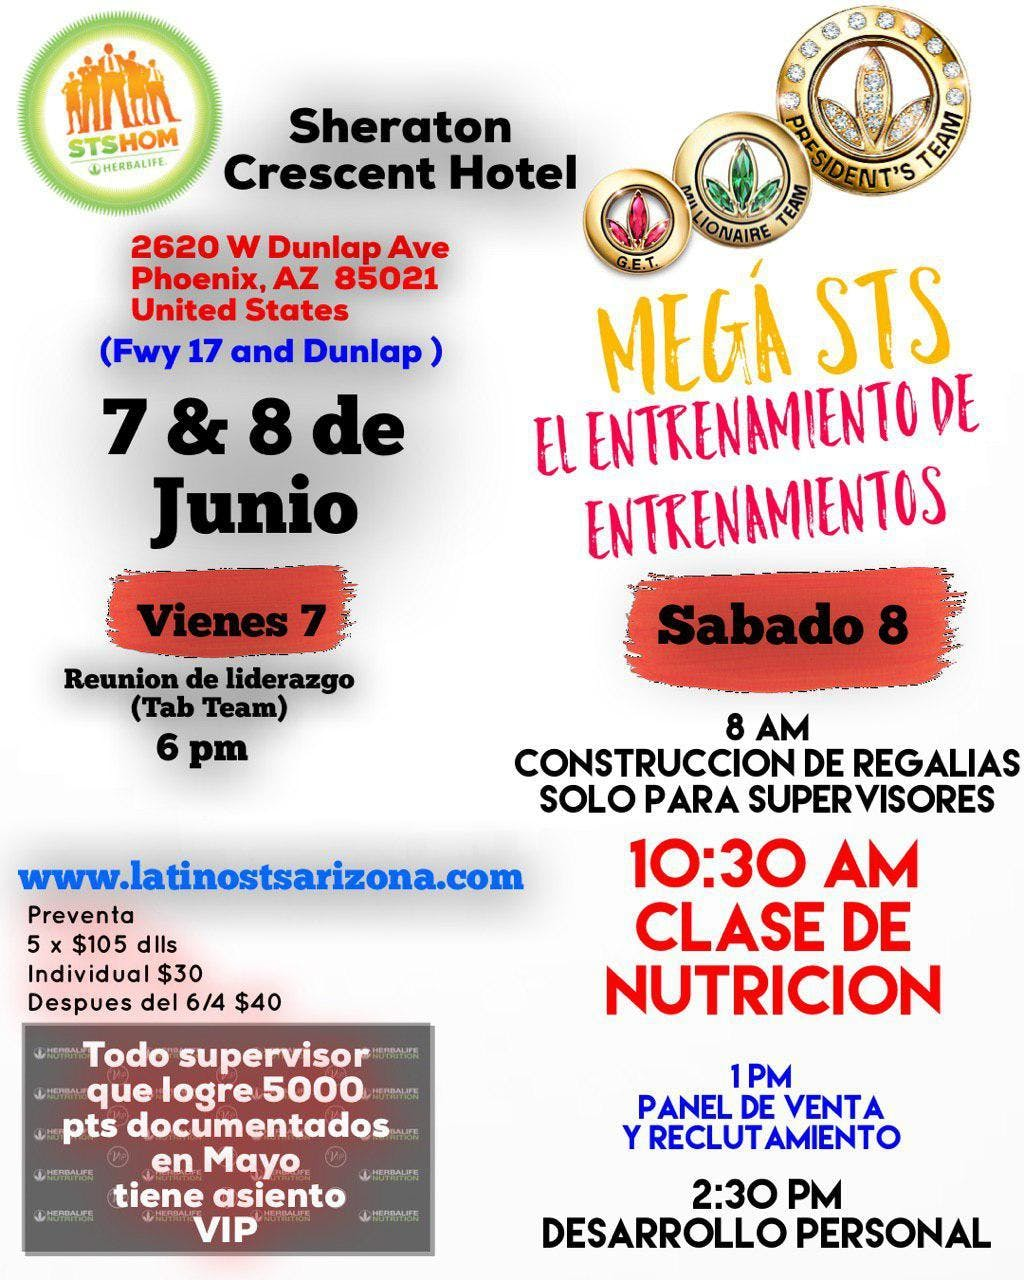 Latino STS julio 06 Arizona 2019